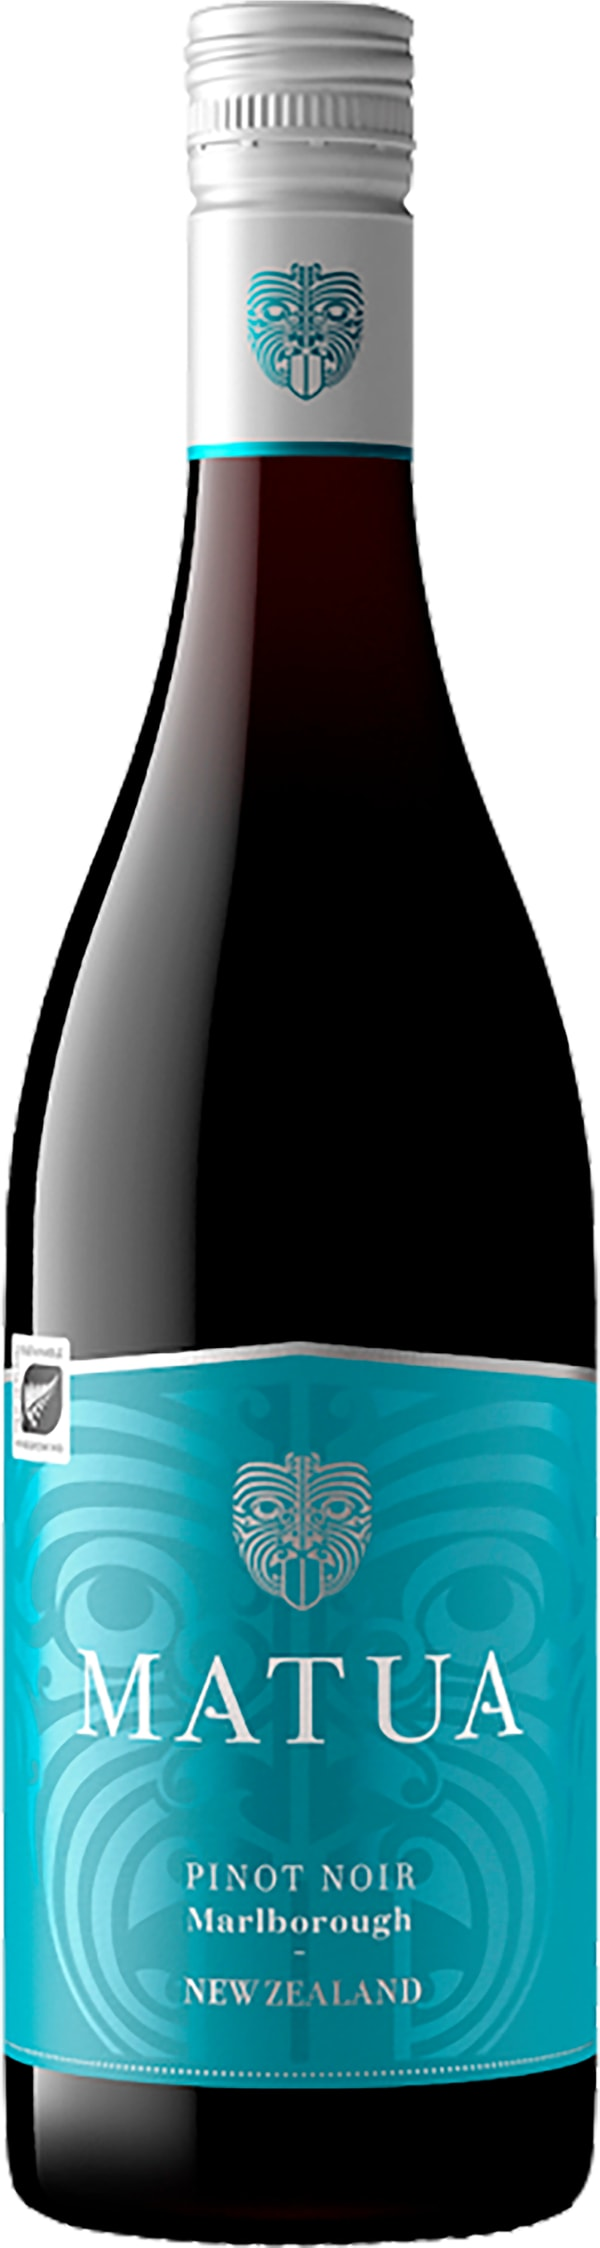 Matua Marlborough Pinot Noir 2016